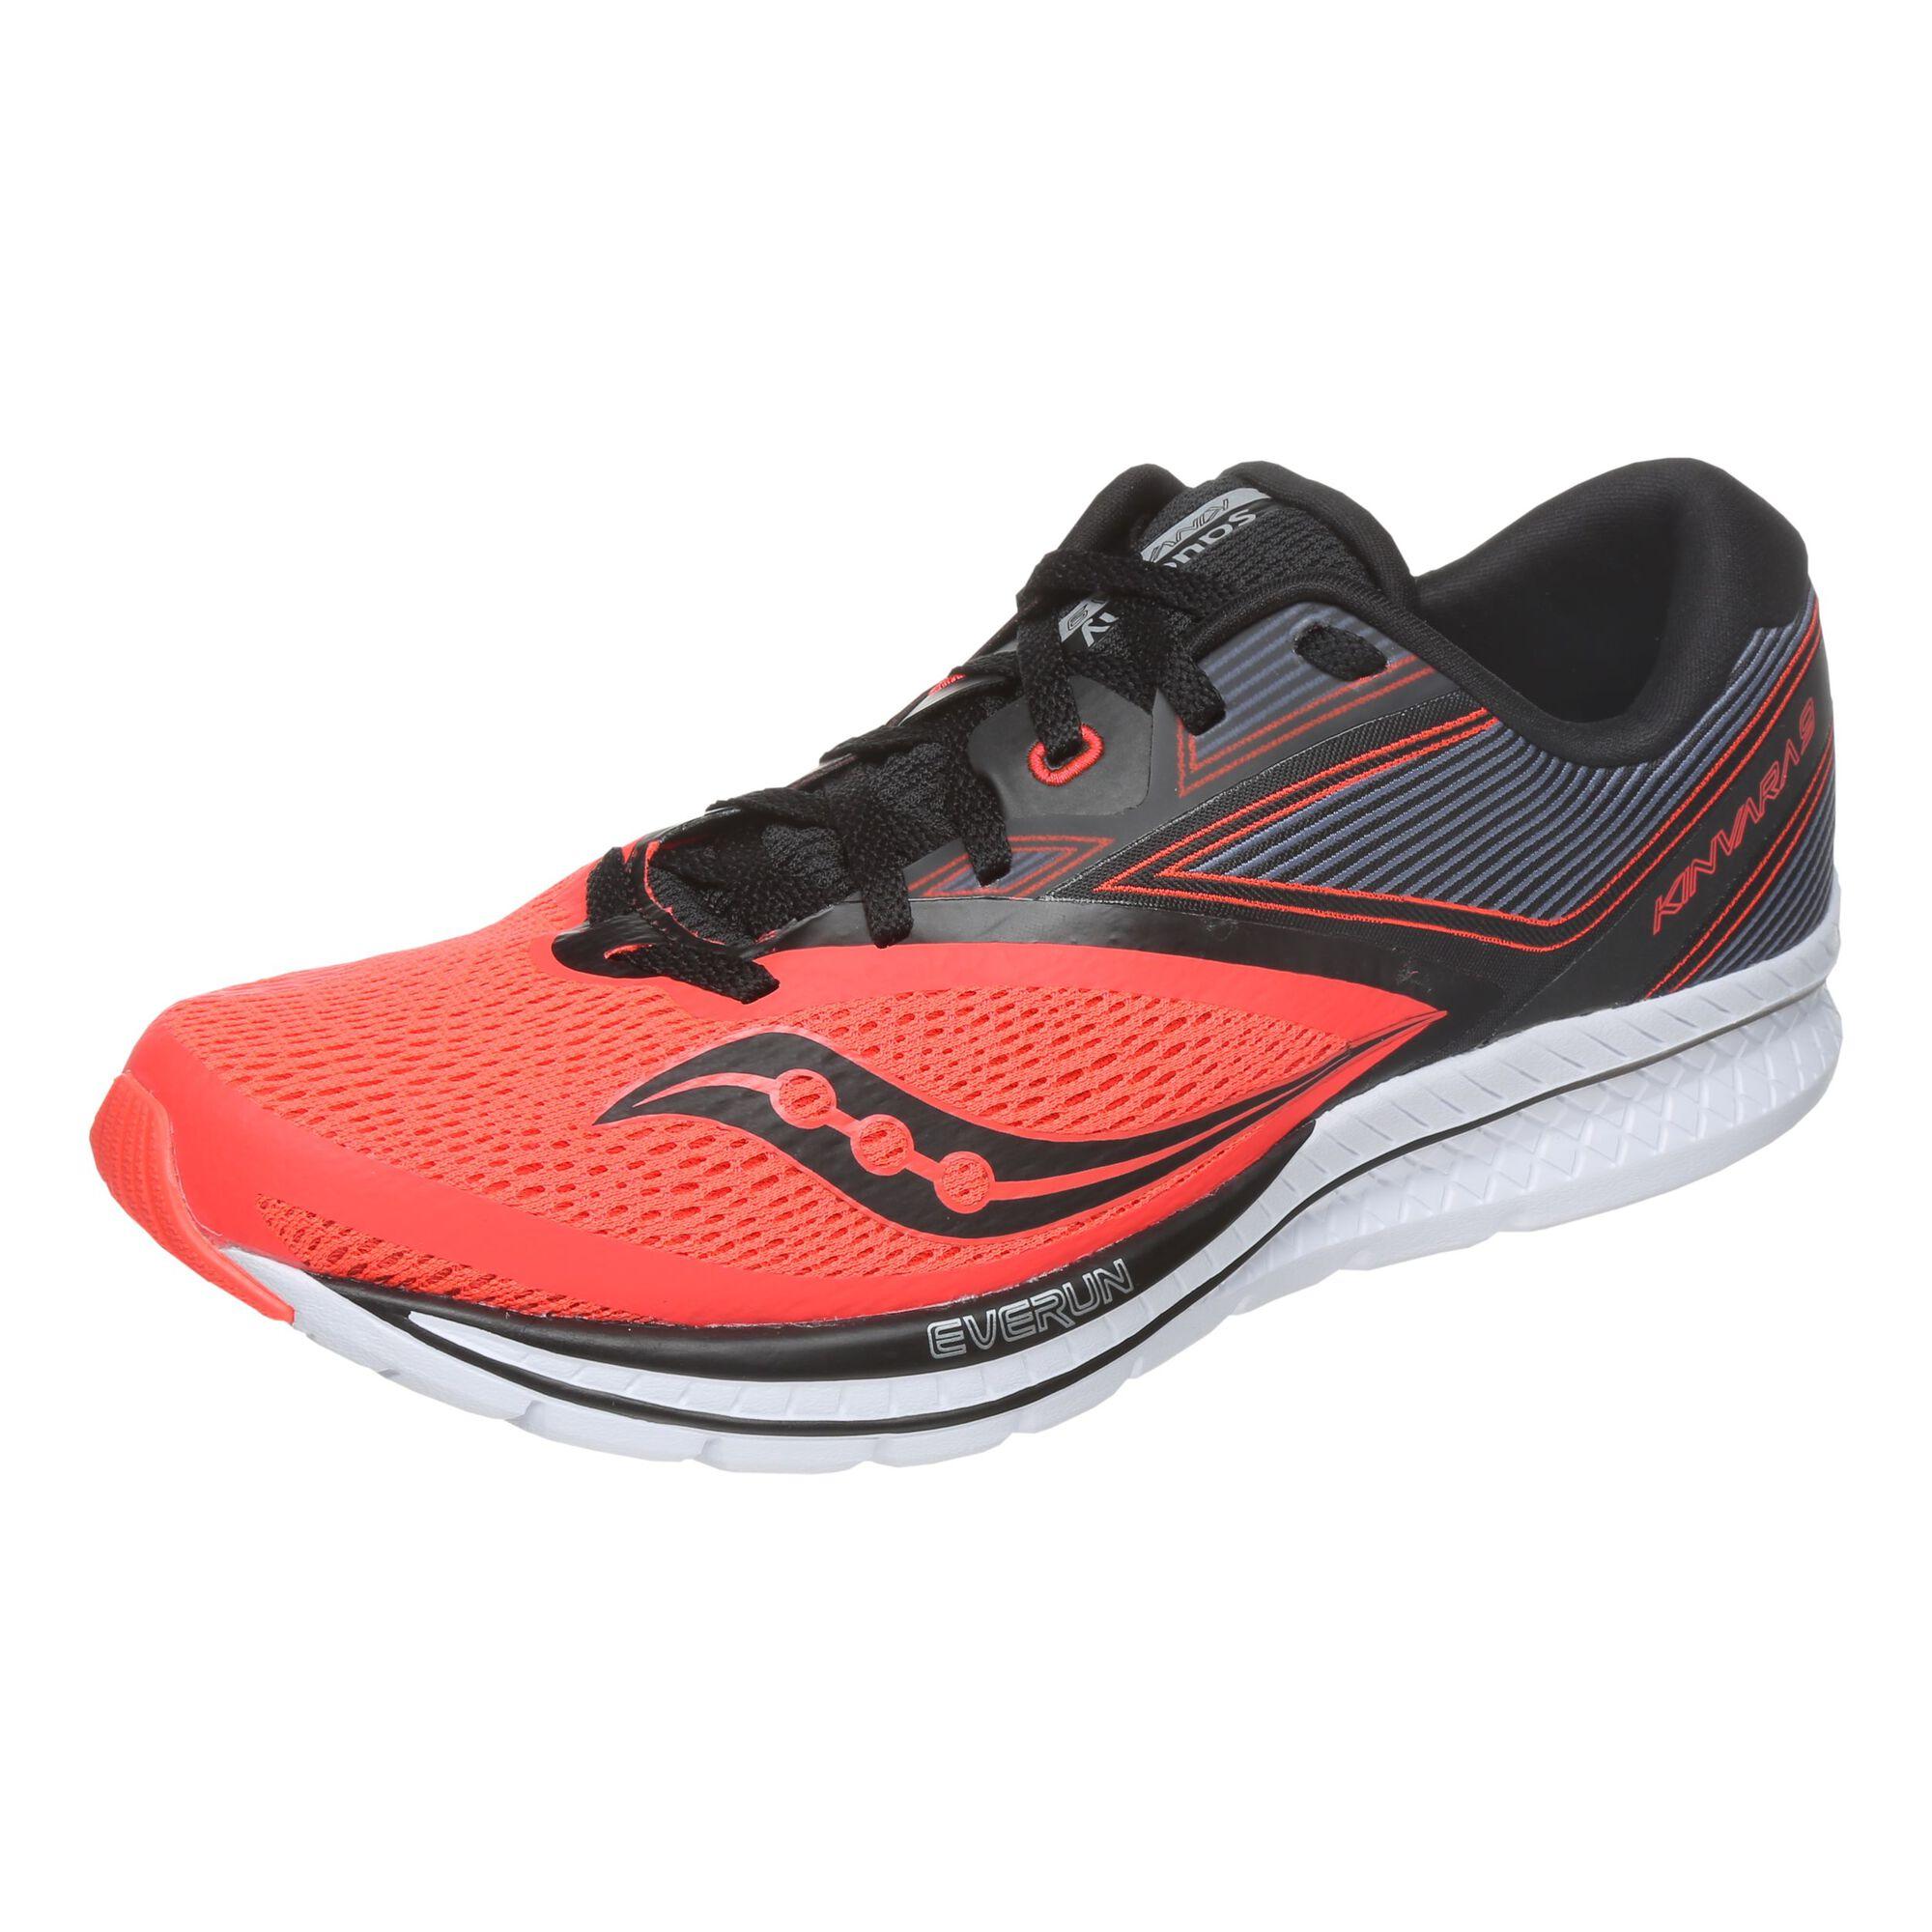 14d2dc2b buy Saucony Kinvara 9 Neutral Running Shoe Men - Red, Black online ...